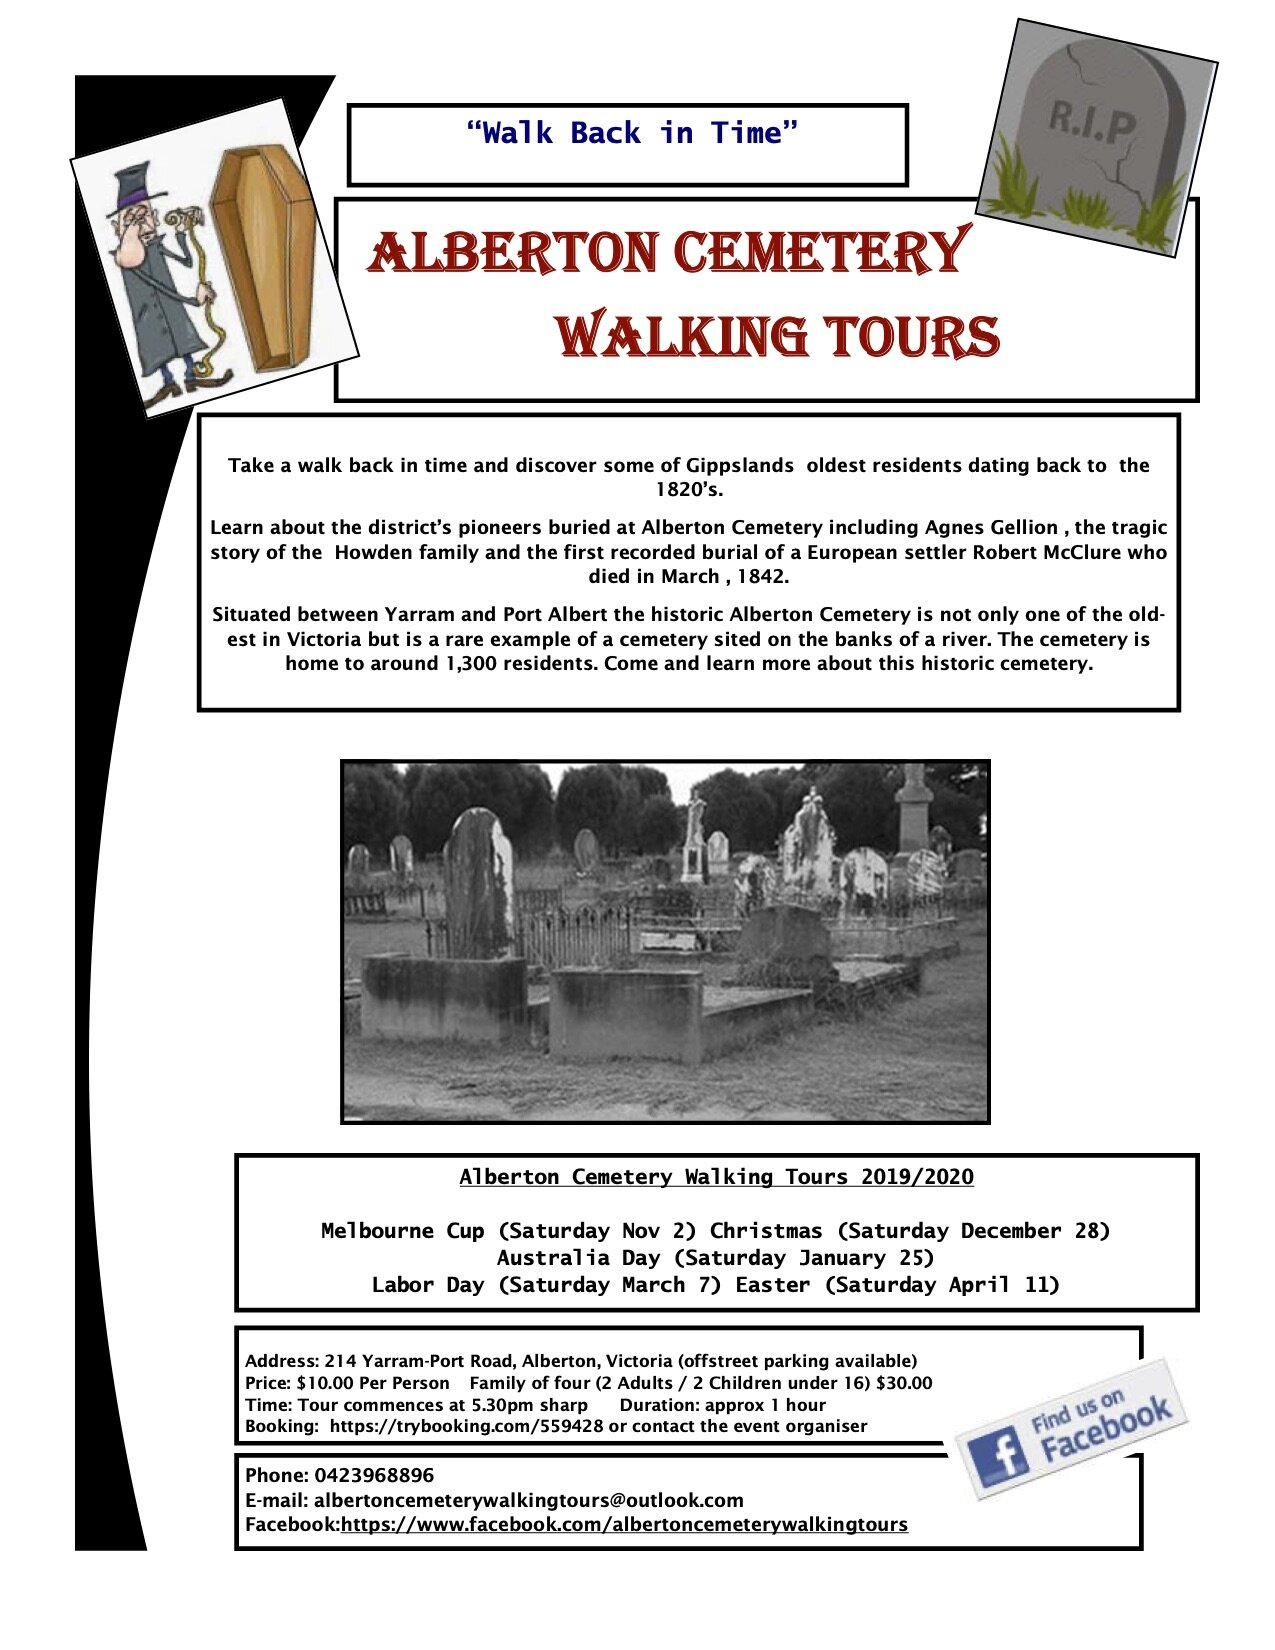 Alberton Cemetery Walking Tours - Flyer.jpg